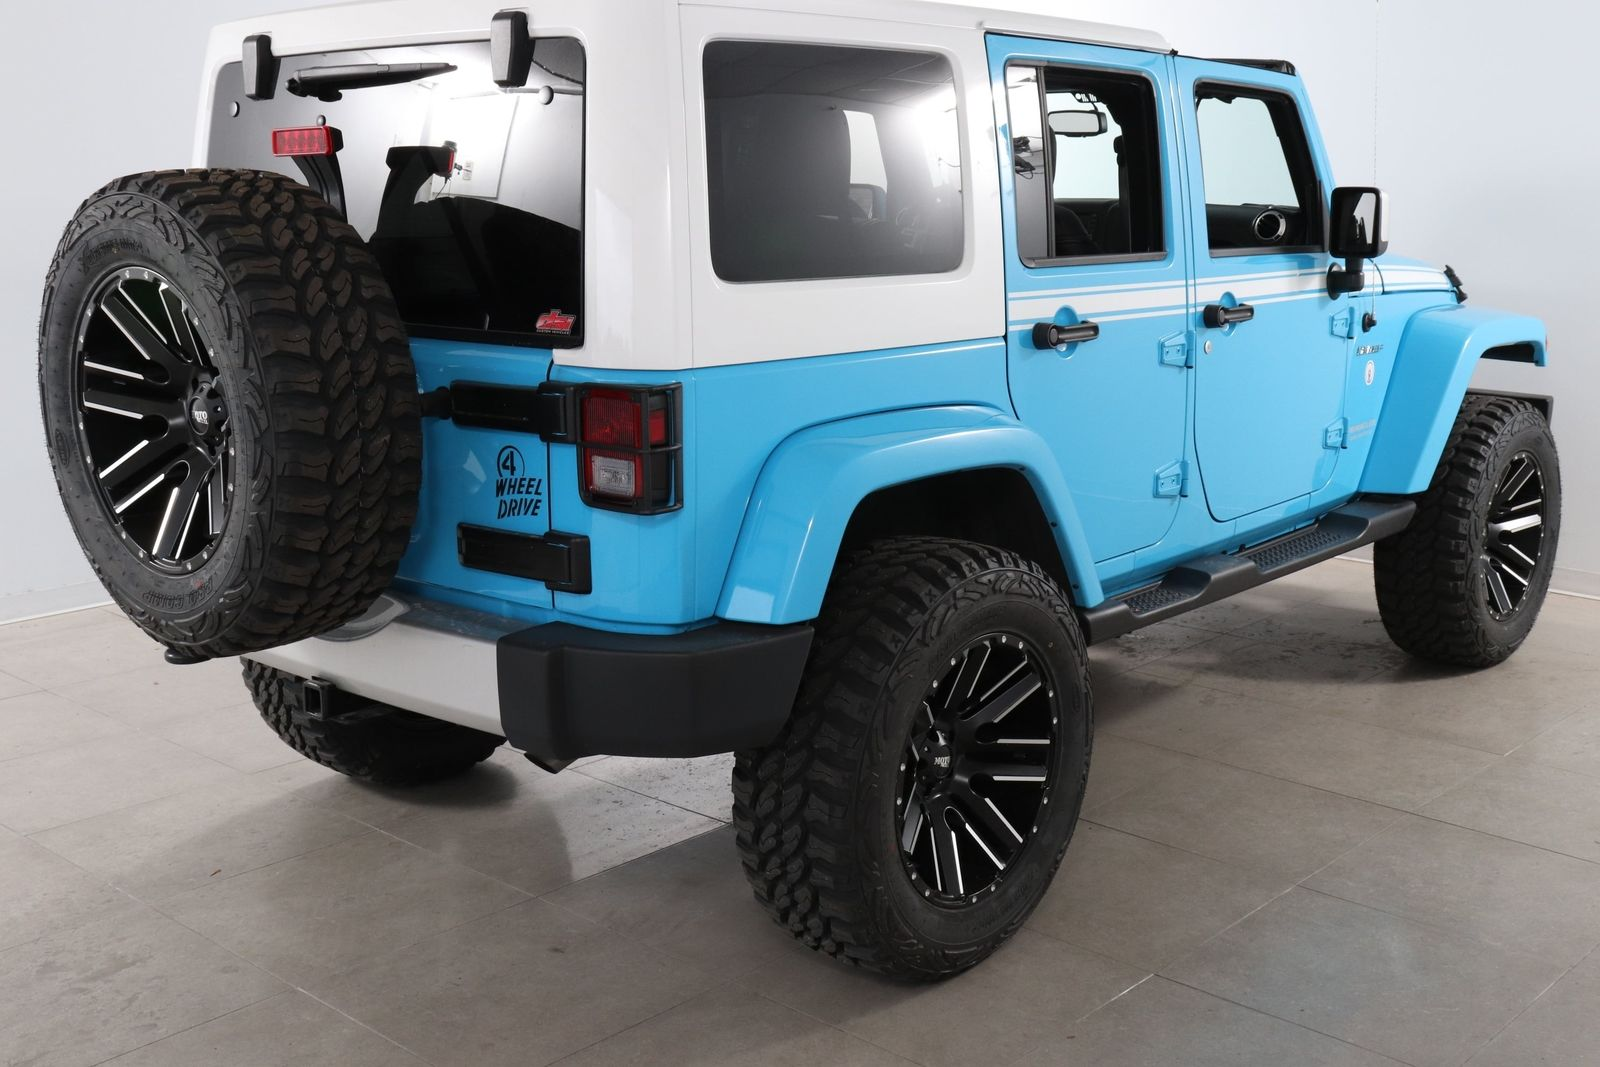 awesome  jeep wrangler sahara chief edition  jeep wrangler unlimited  sahara chief